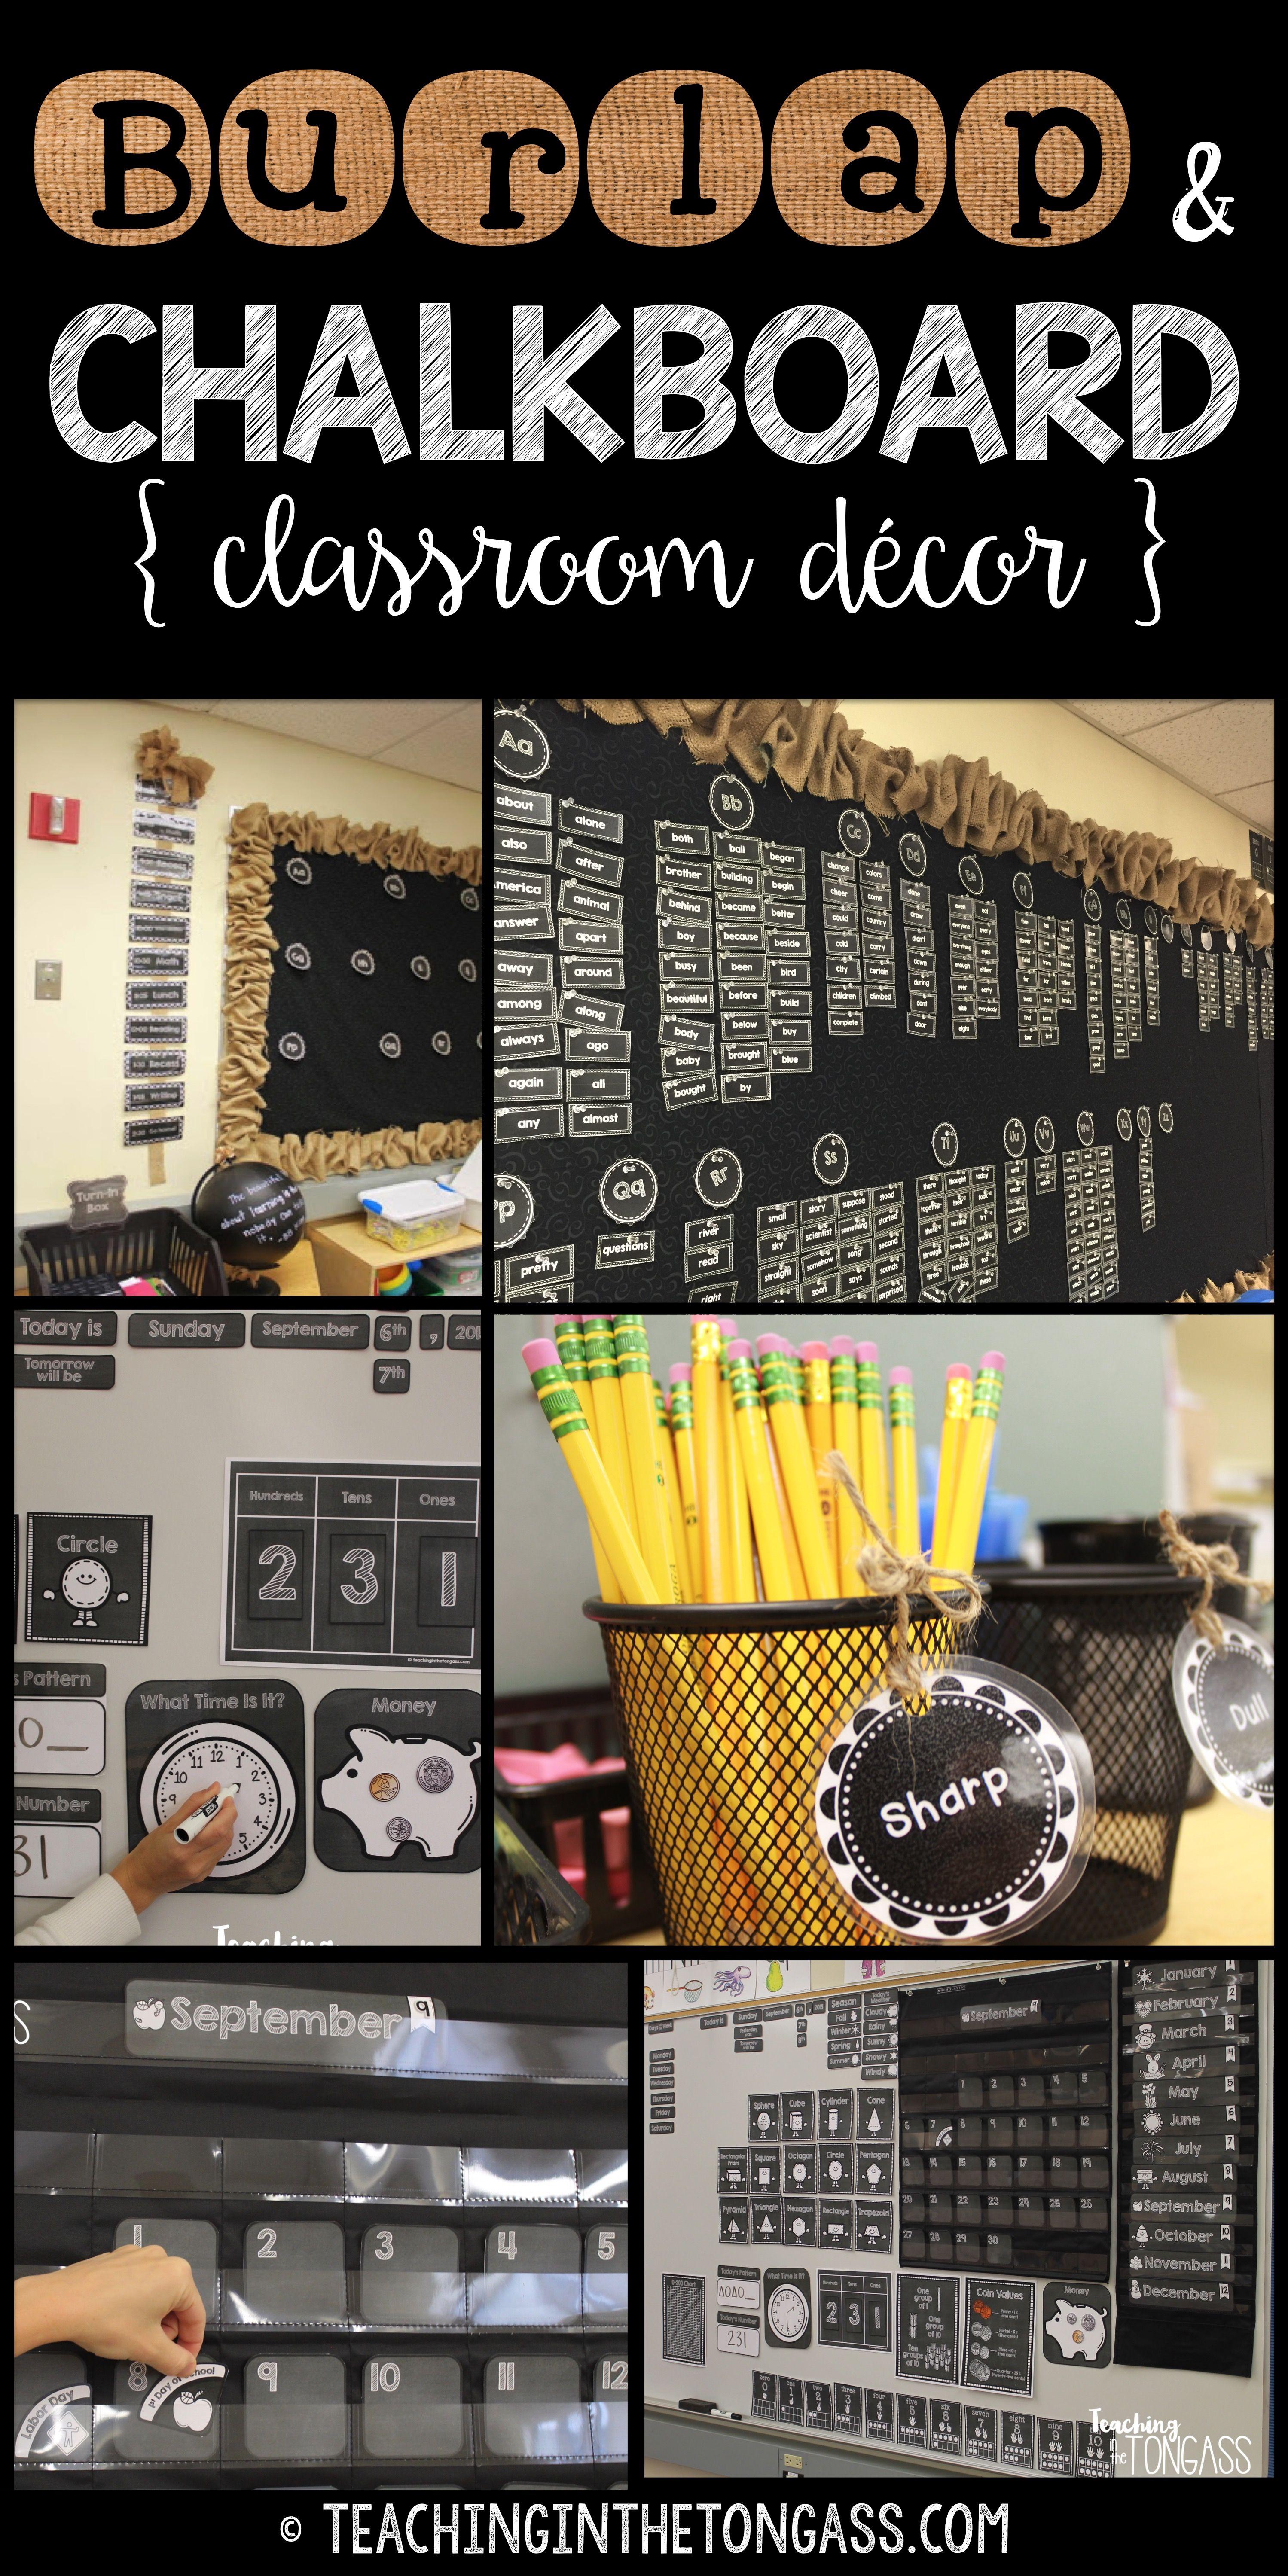 Burlap And Chalkboard Bulletin Board And Classroom Decor Teaching